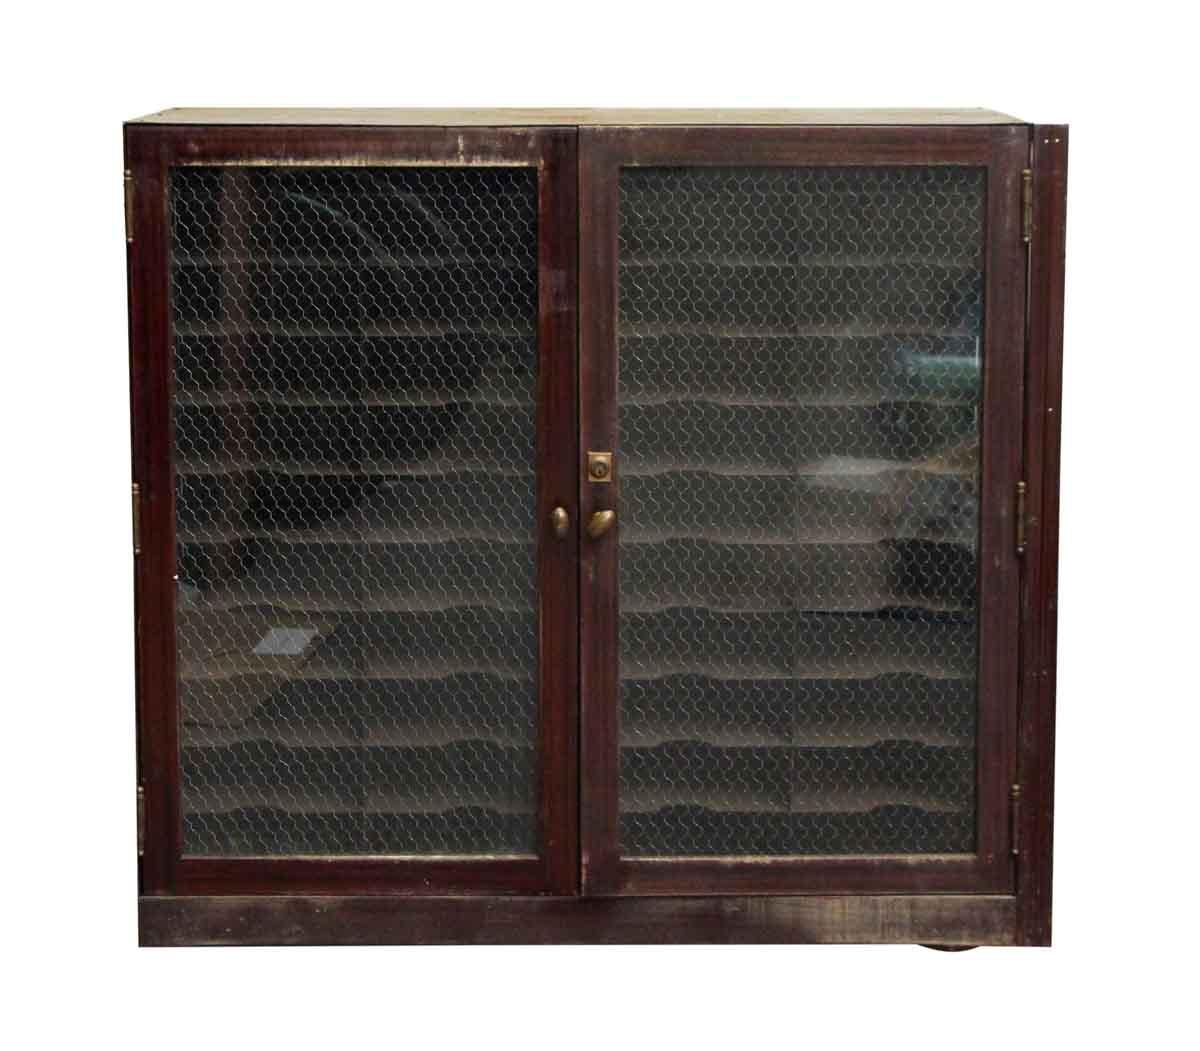 Chicken Wire Kitchen Cabinet Doors: Metal Cabinet With Chicken Wire Glass Doors